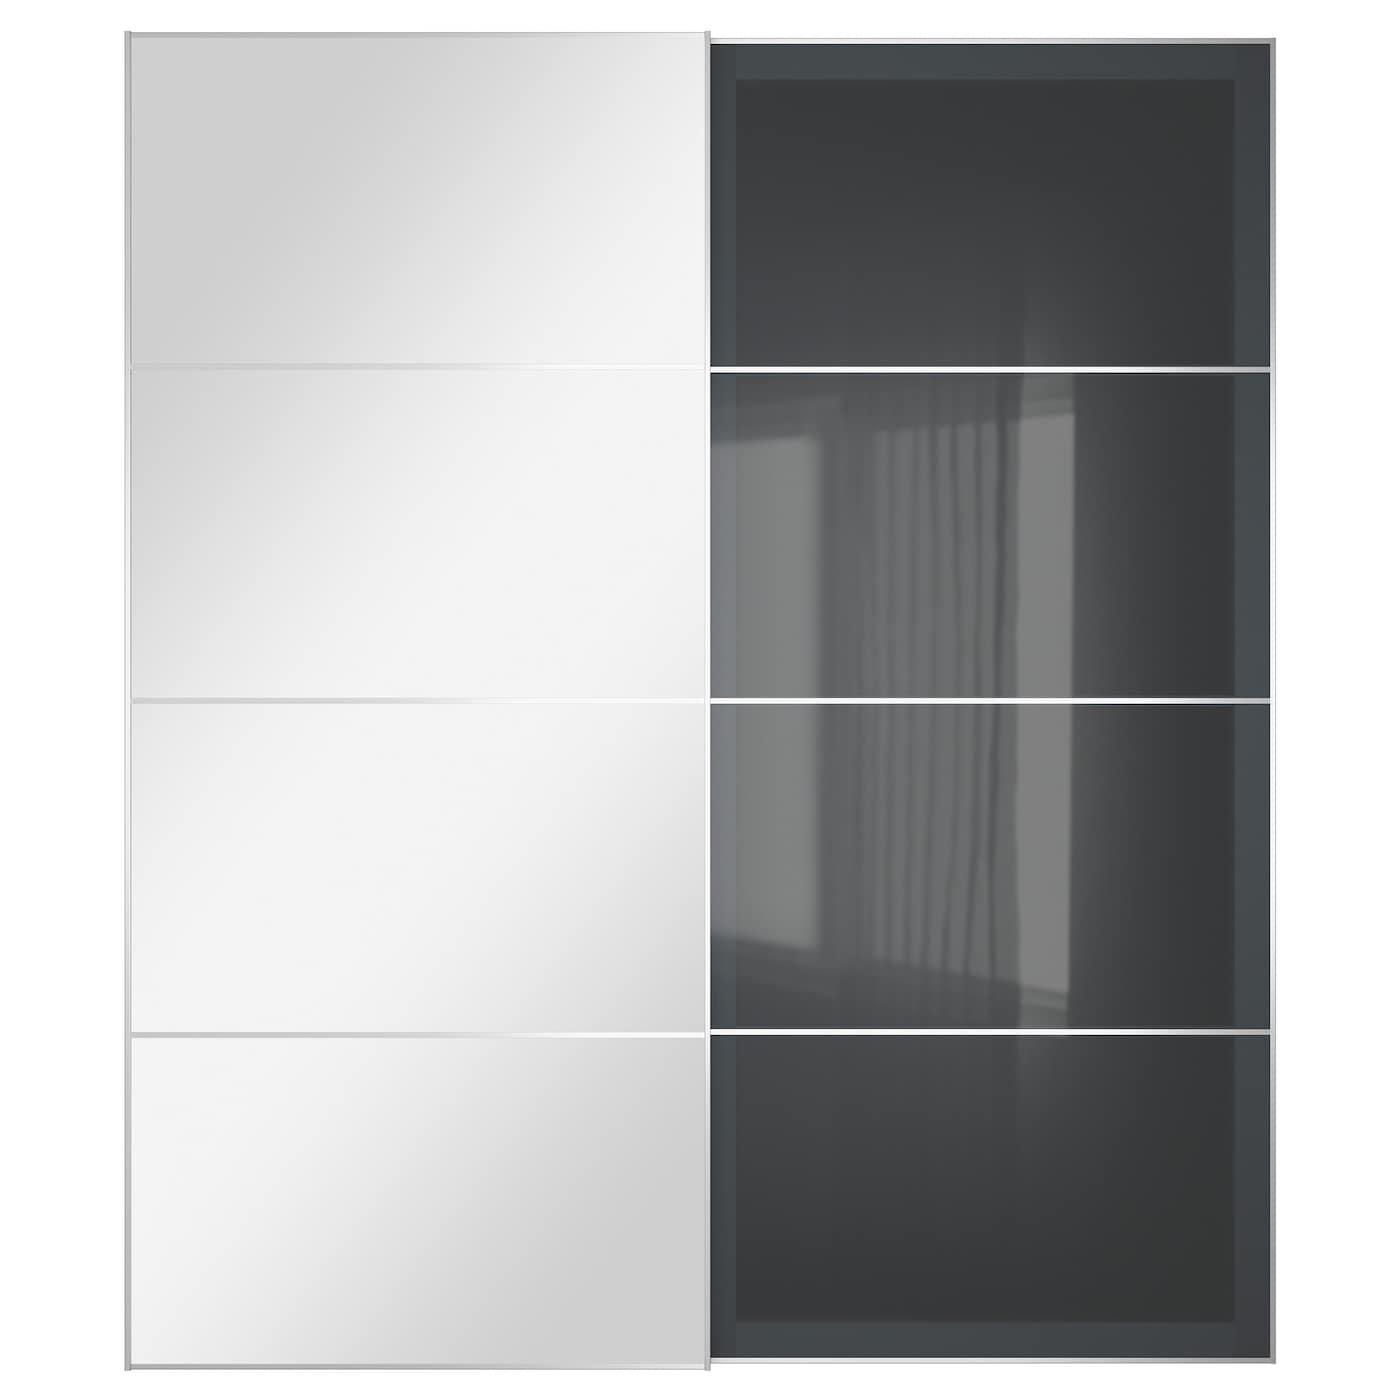 UGGDAL AULI Pair of sliding doors Mirror glass grey glass 200x236